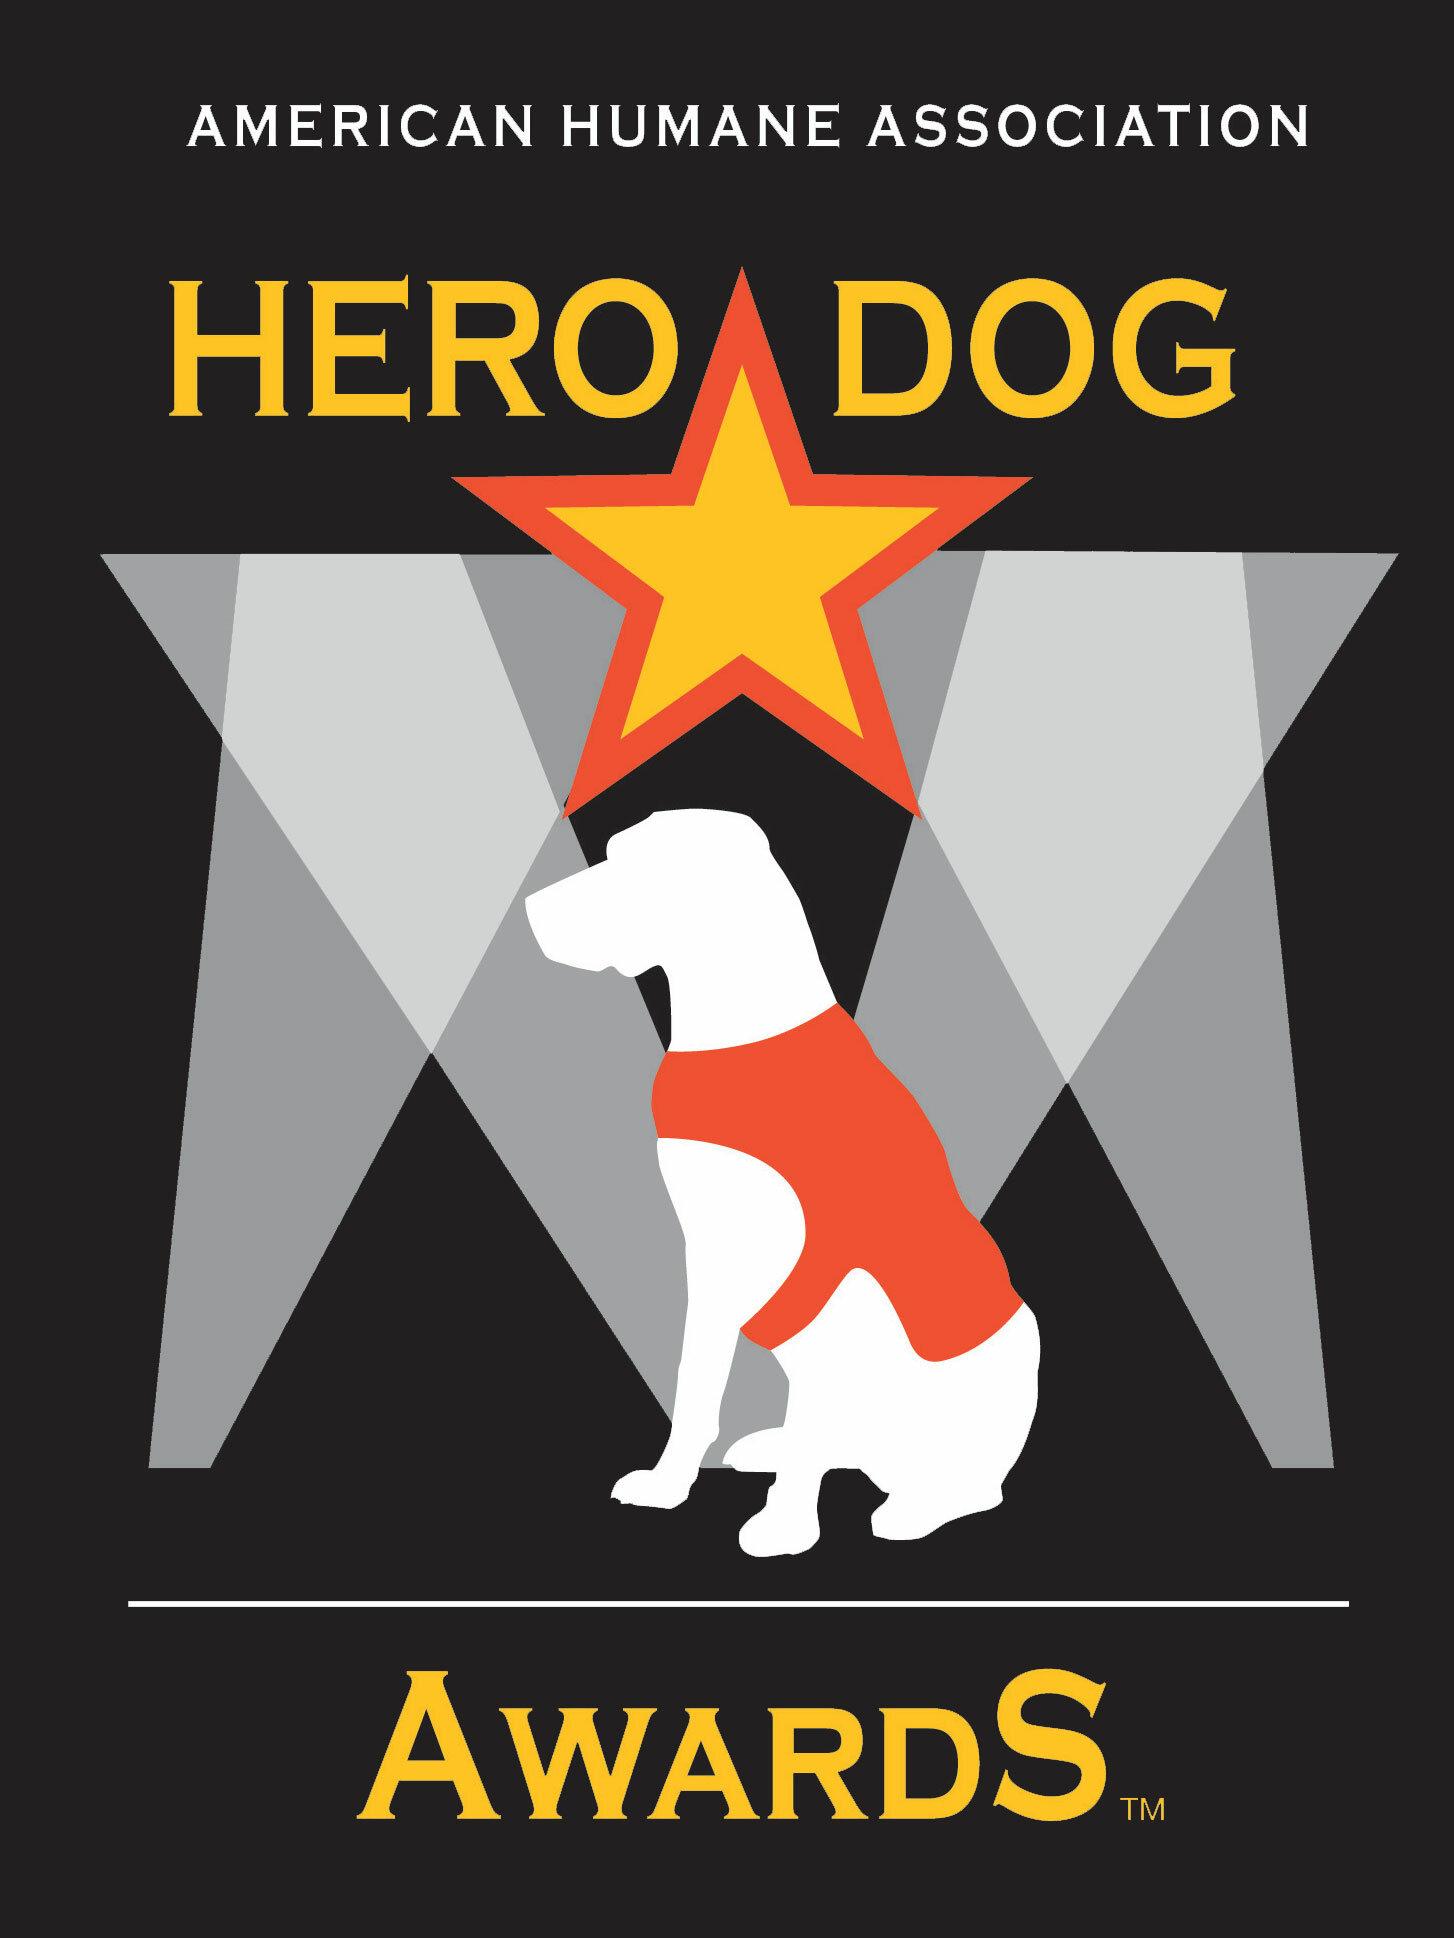 American Humane Association Hero Dog Awards ne zaman